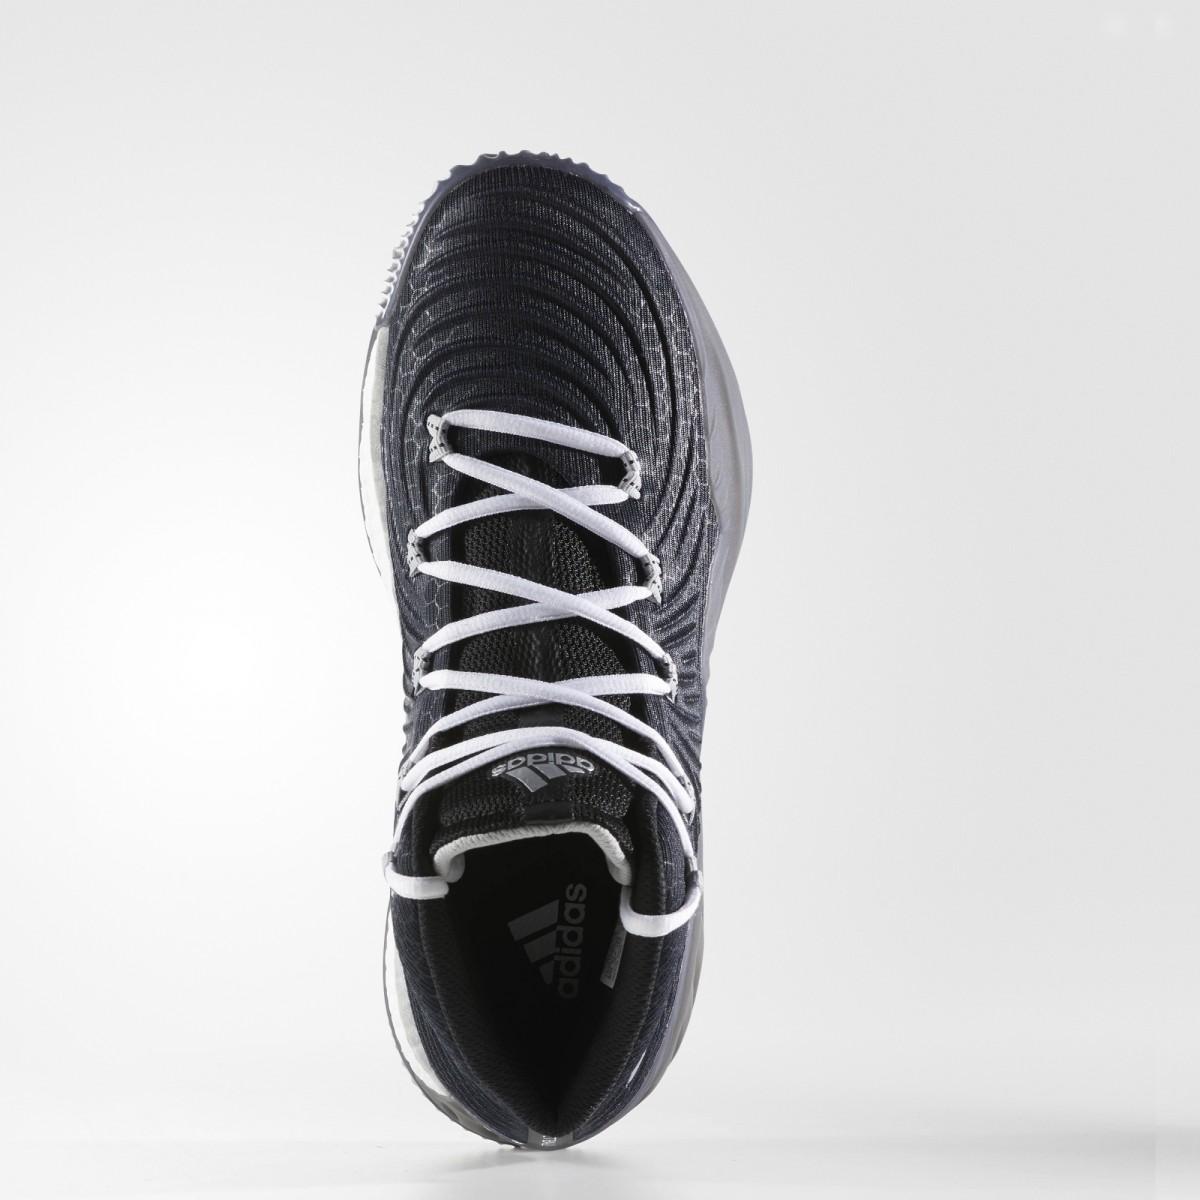 Adidas Crazy Explosive 2017 'Black/White' BW0985